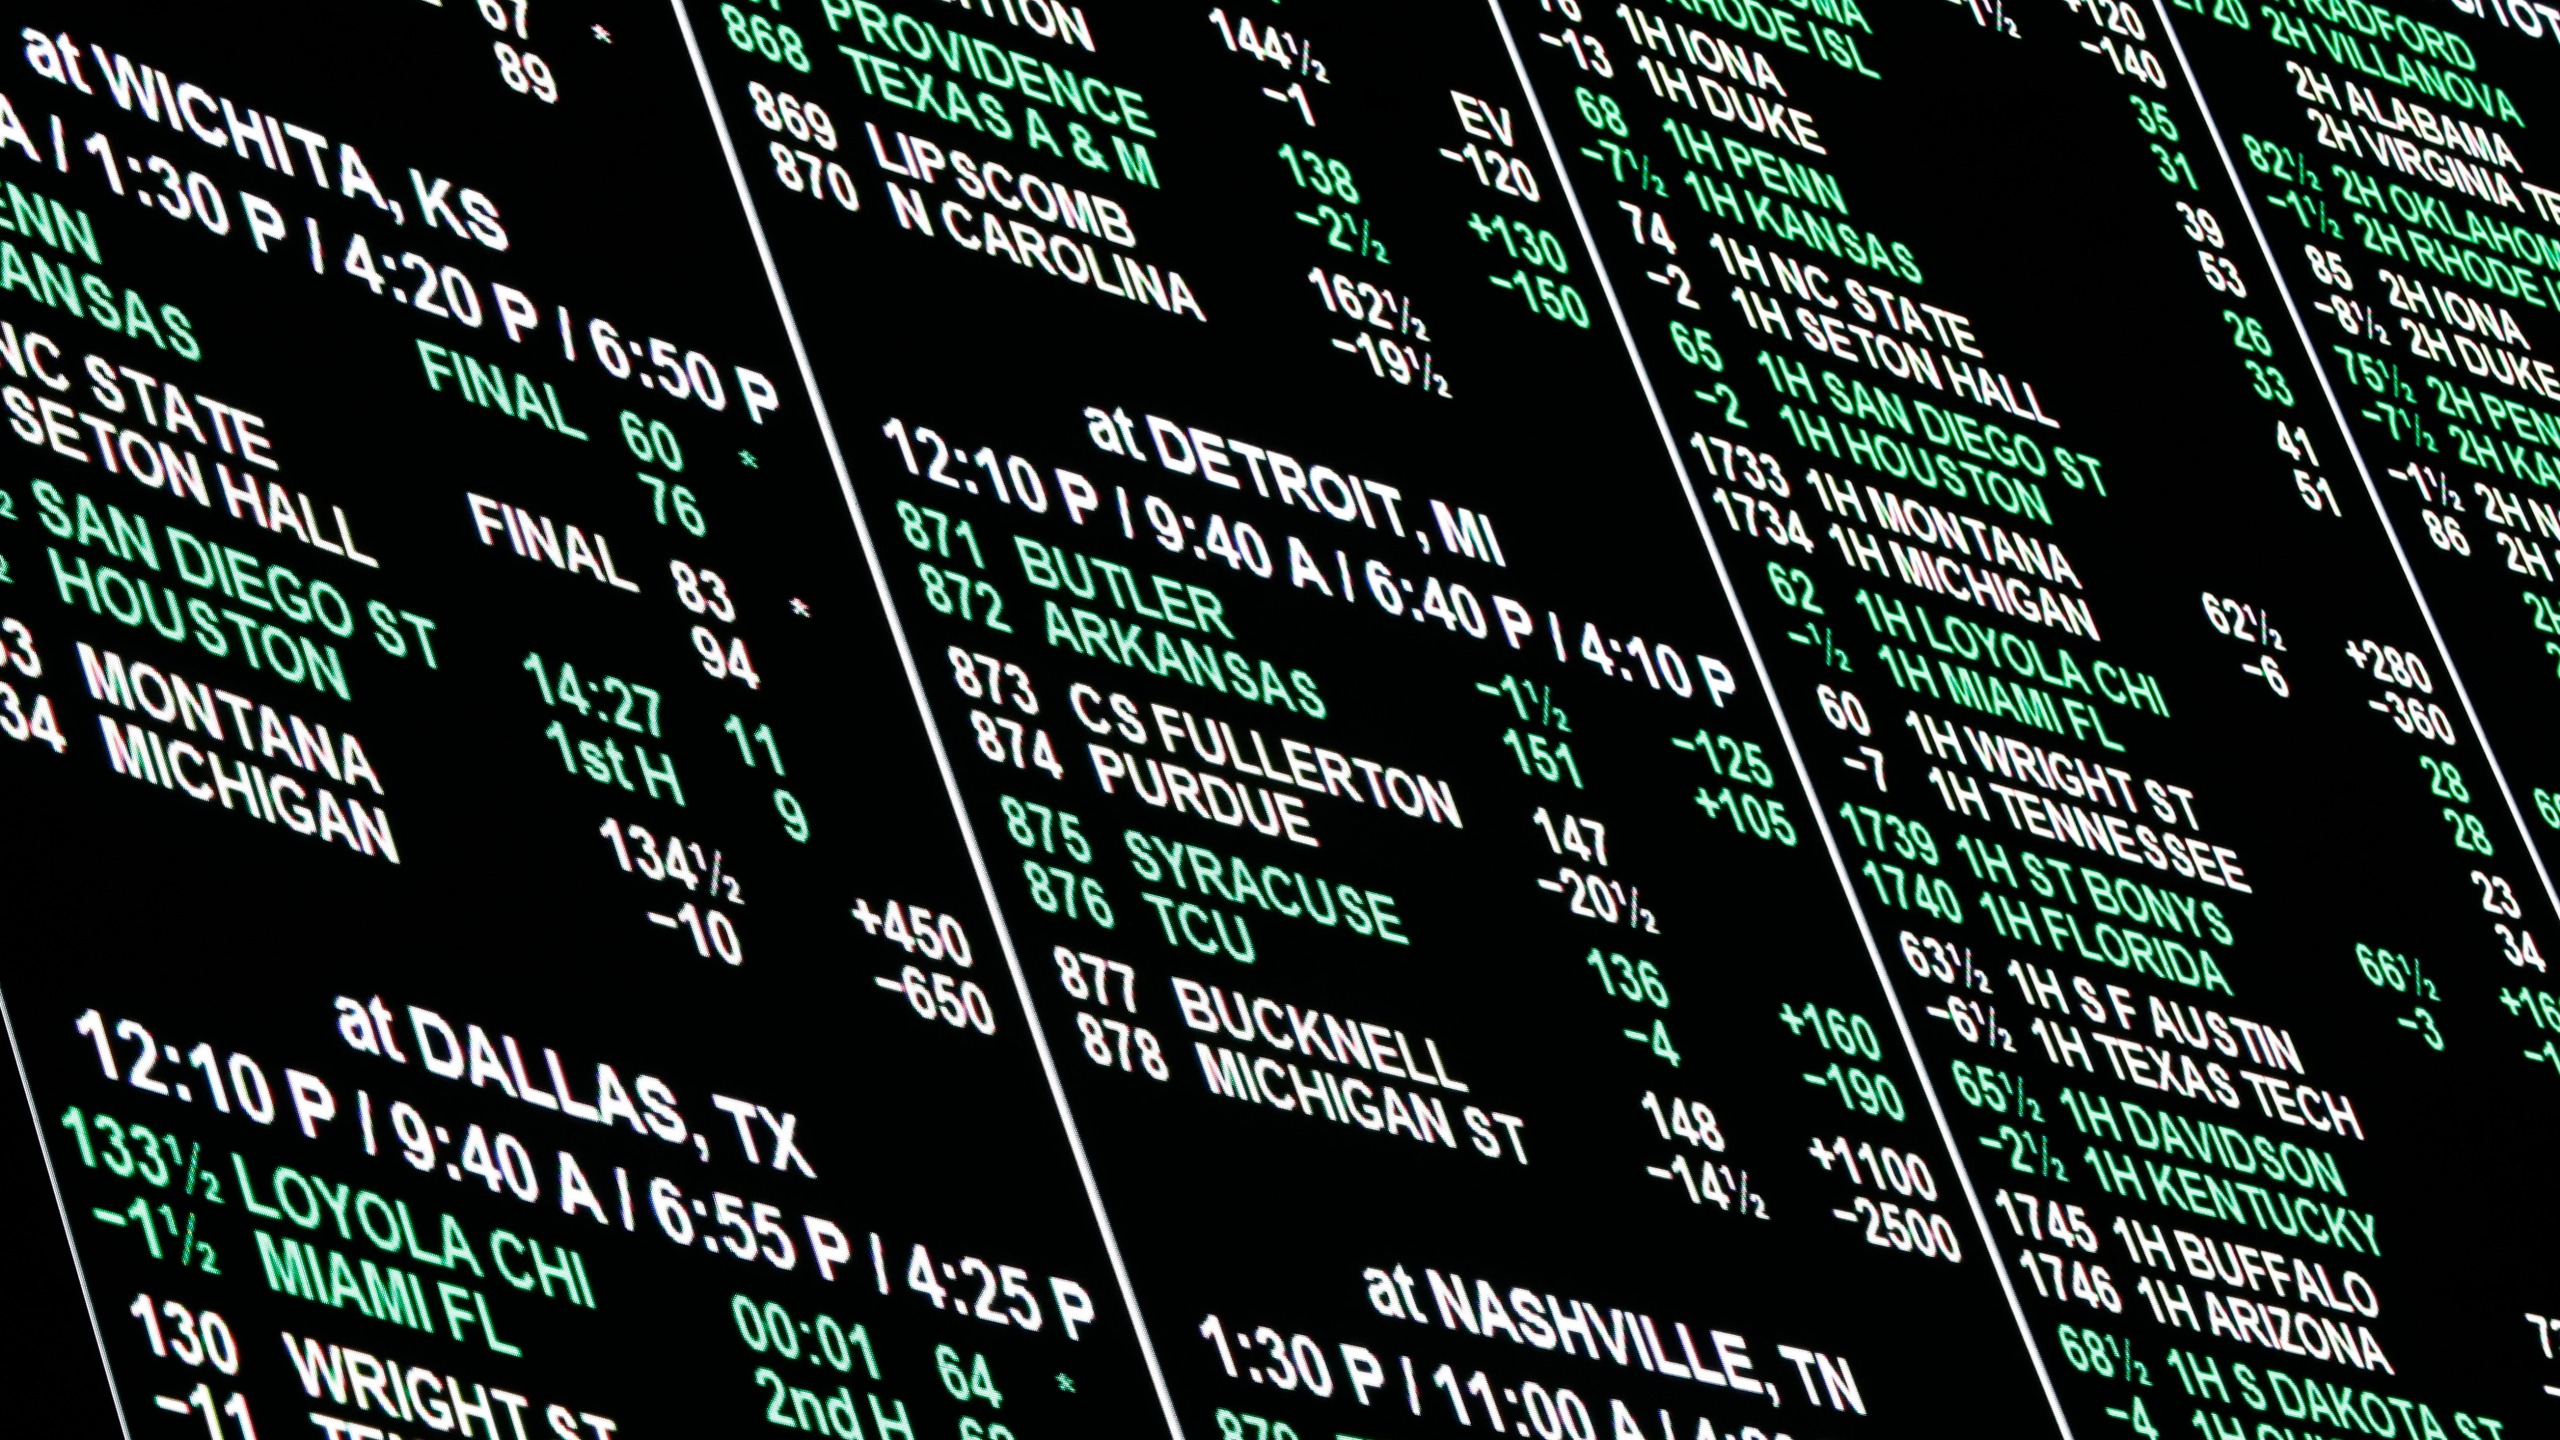 Sports_Gambling_Fighting_the_Fix_25352-159532.jpg20658129